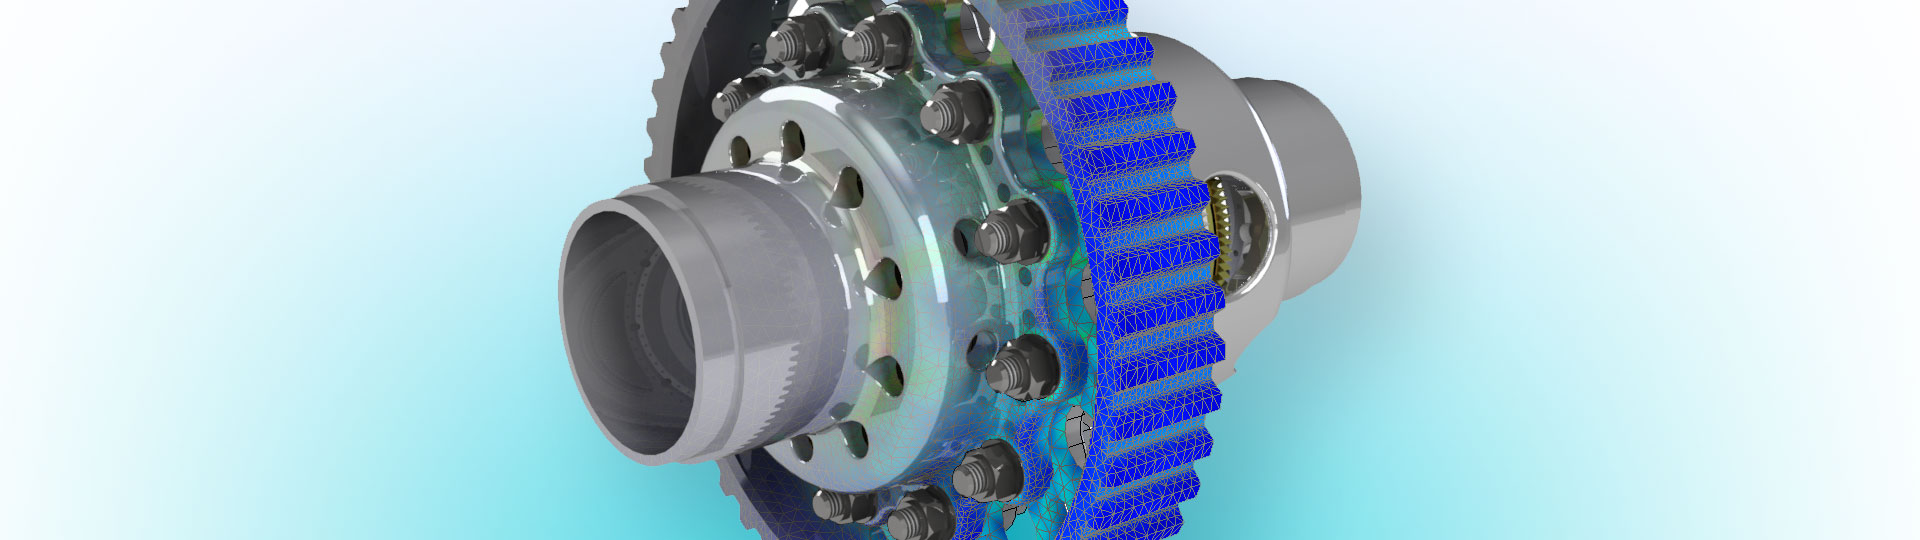 simulation autodesk